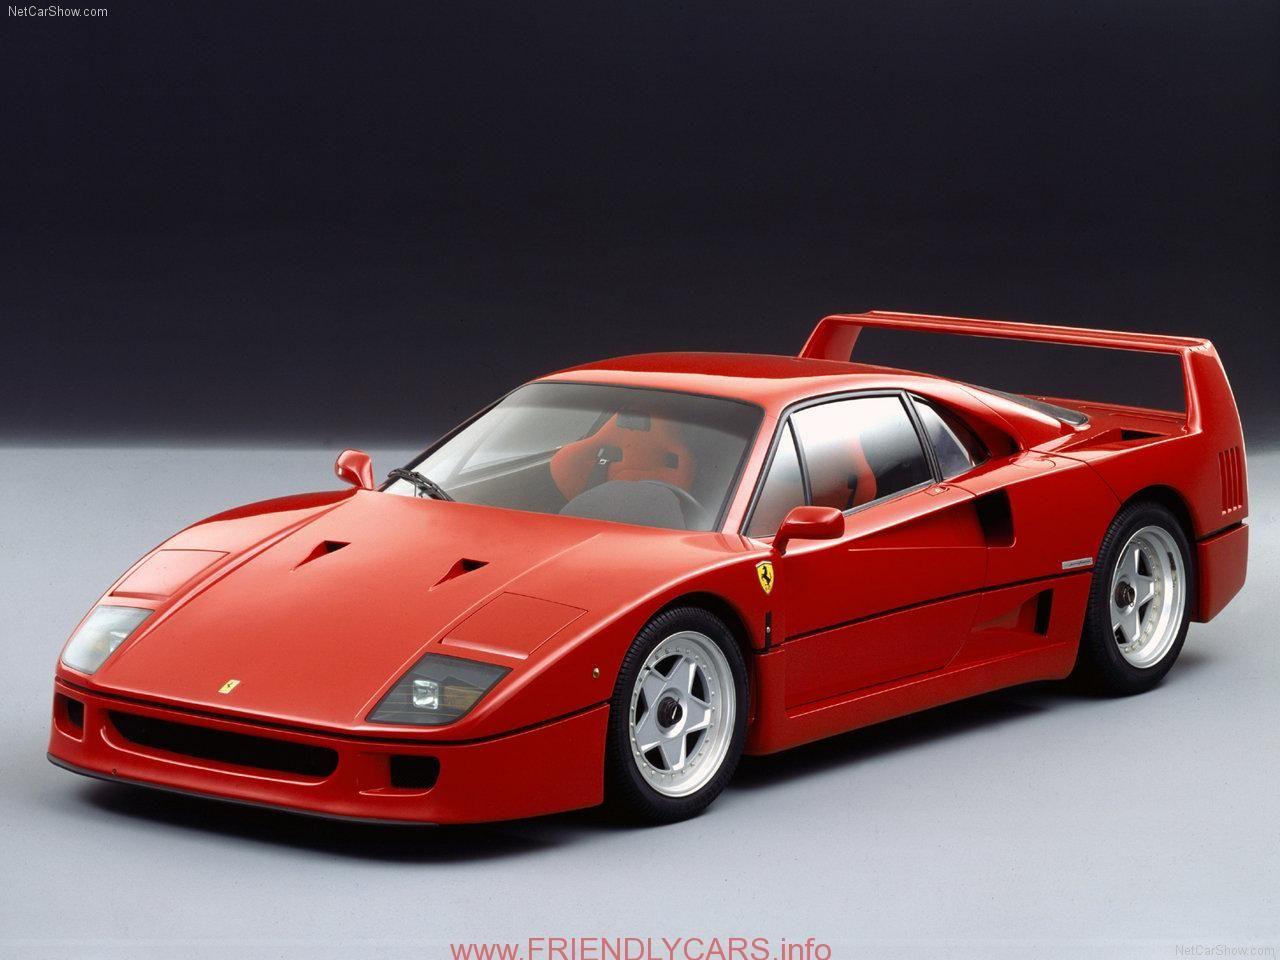 Nice Black Ferrari F40 Wallpaper Car Images Hd Ferrari F40 HD Wallpapers